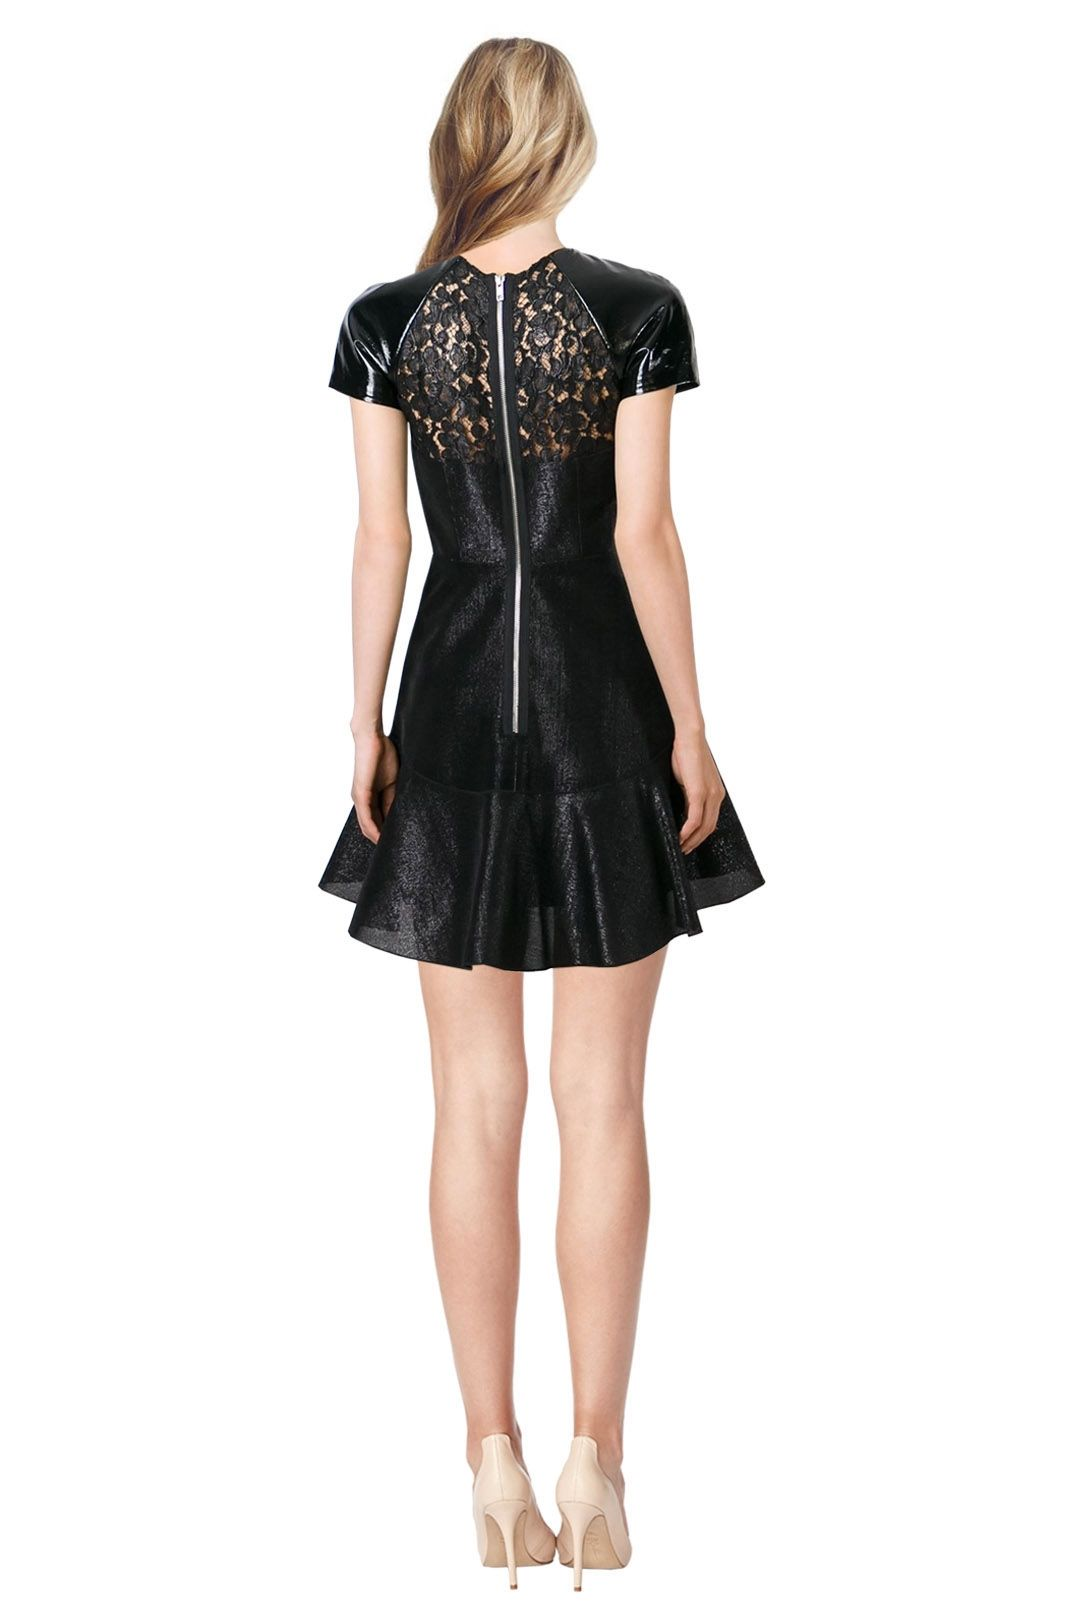 Alex Perry - Pascale Dress - Black - Back